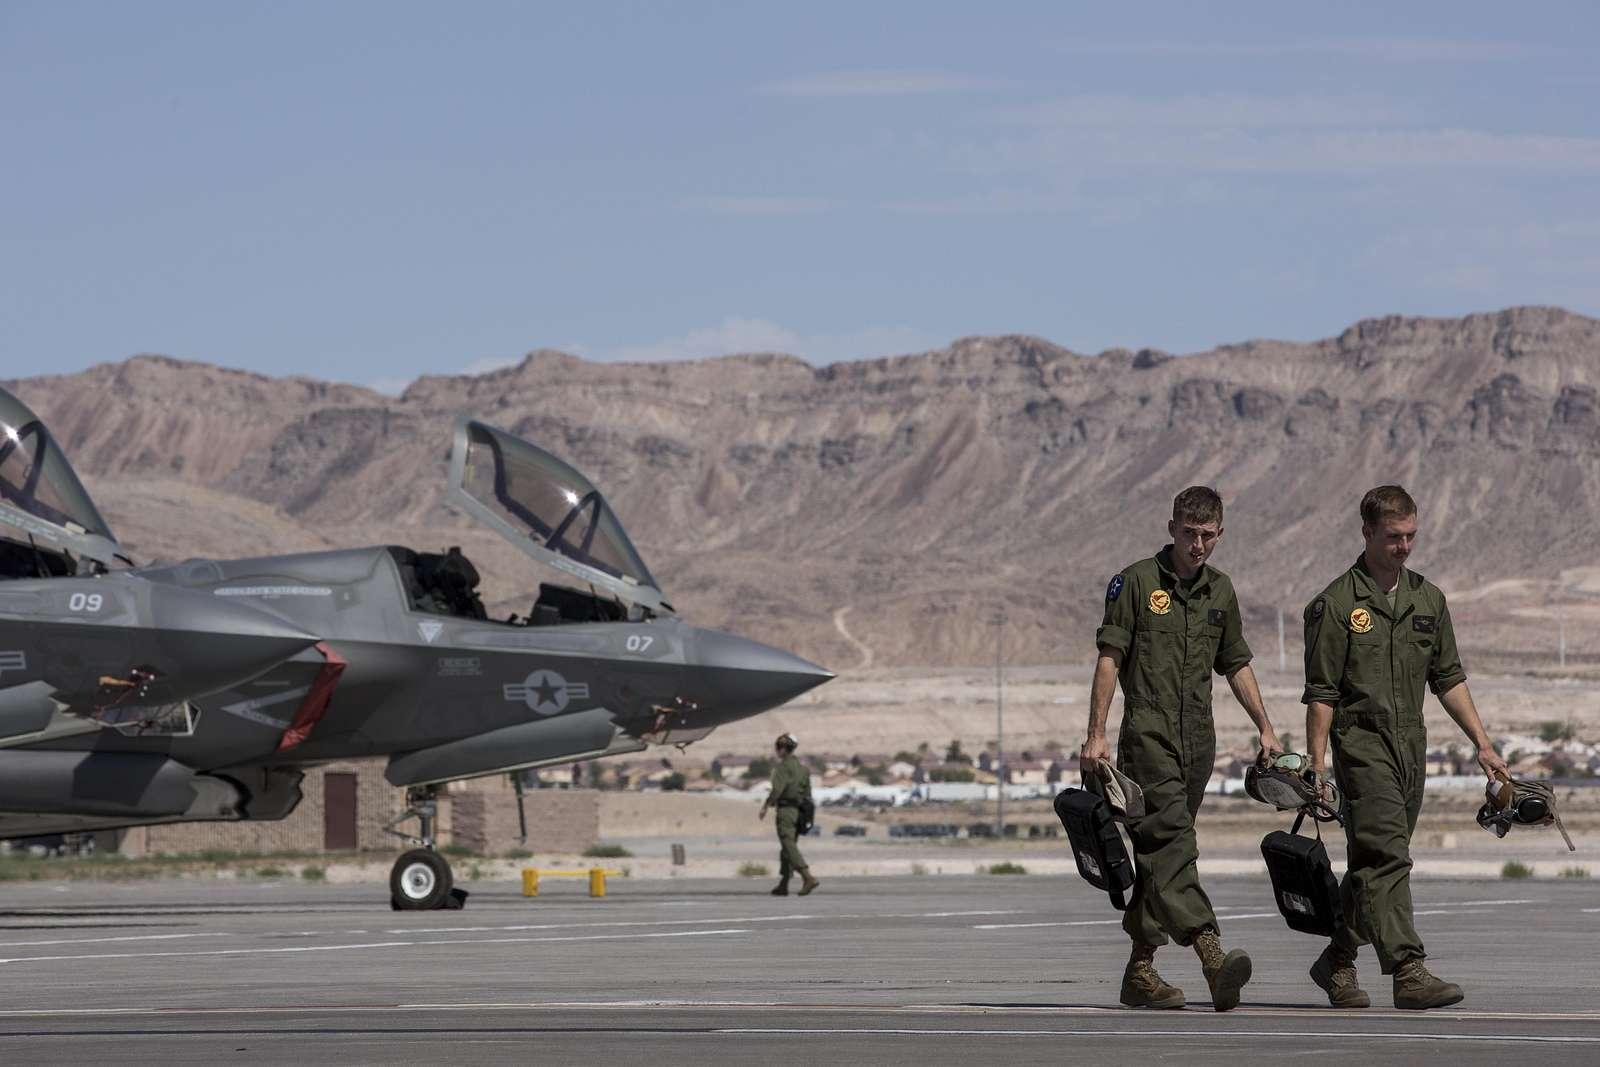 Lockheed Martin F-35B Lightning IIs at Nellis Air Force Base, Nev.